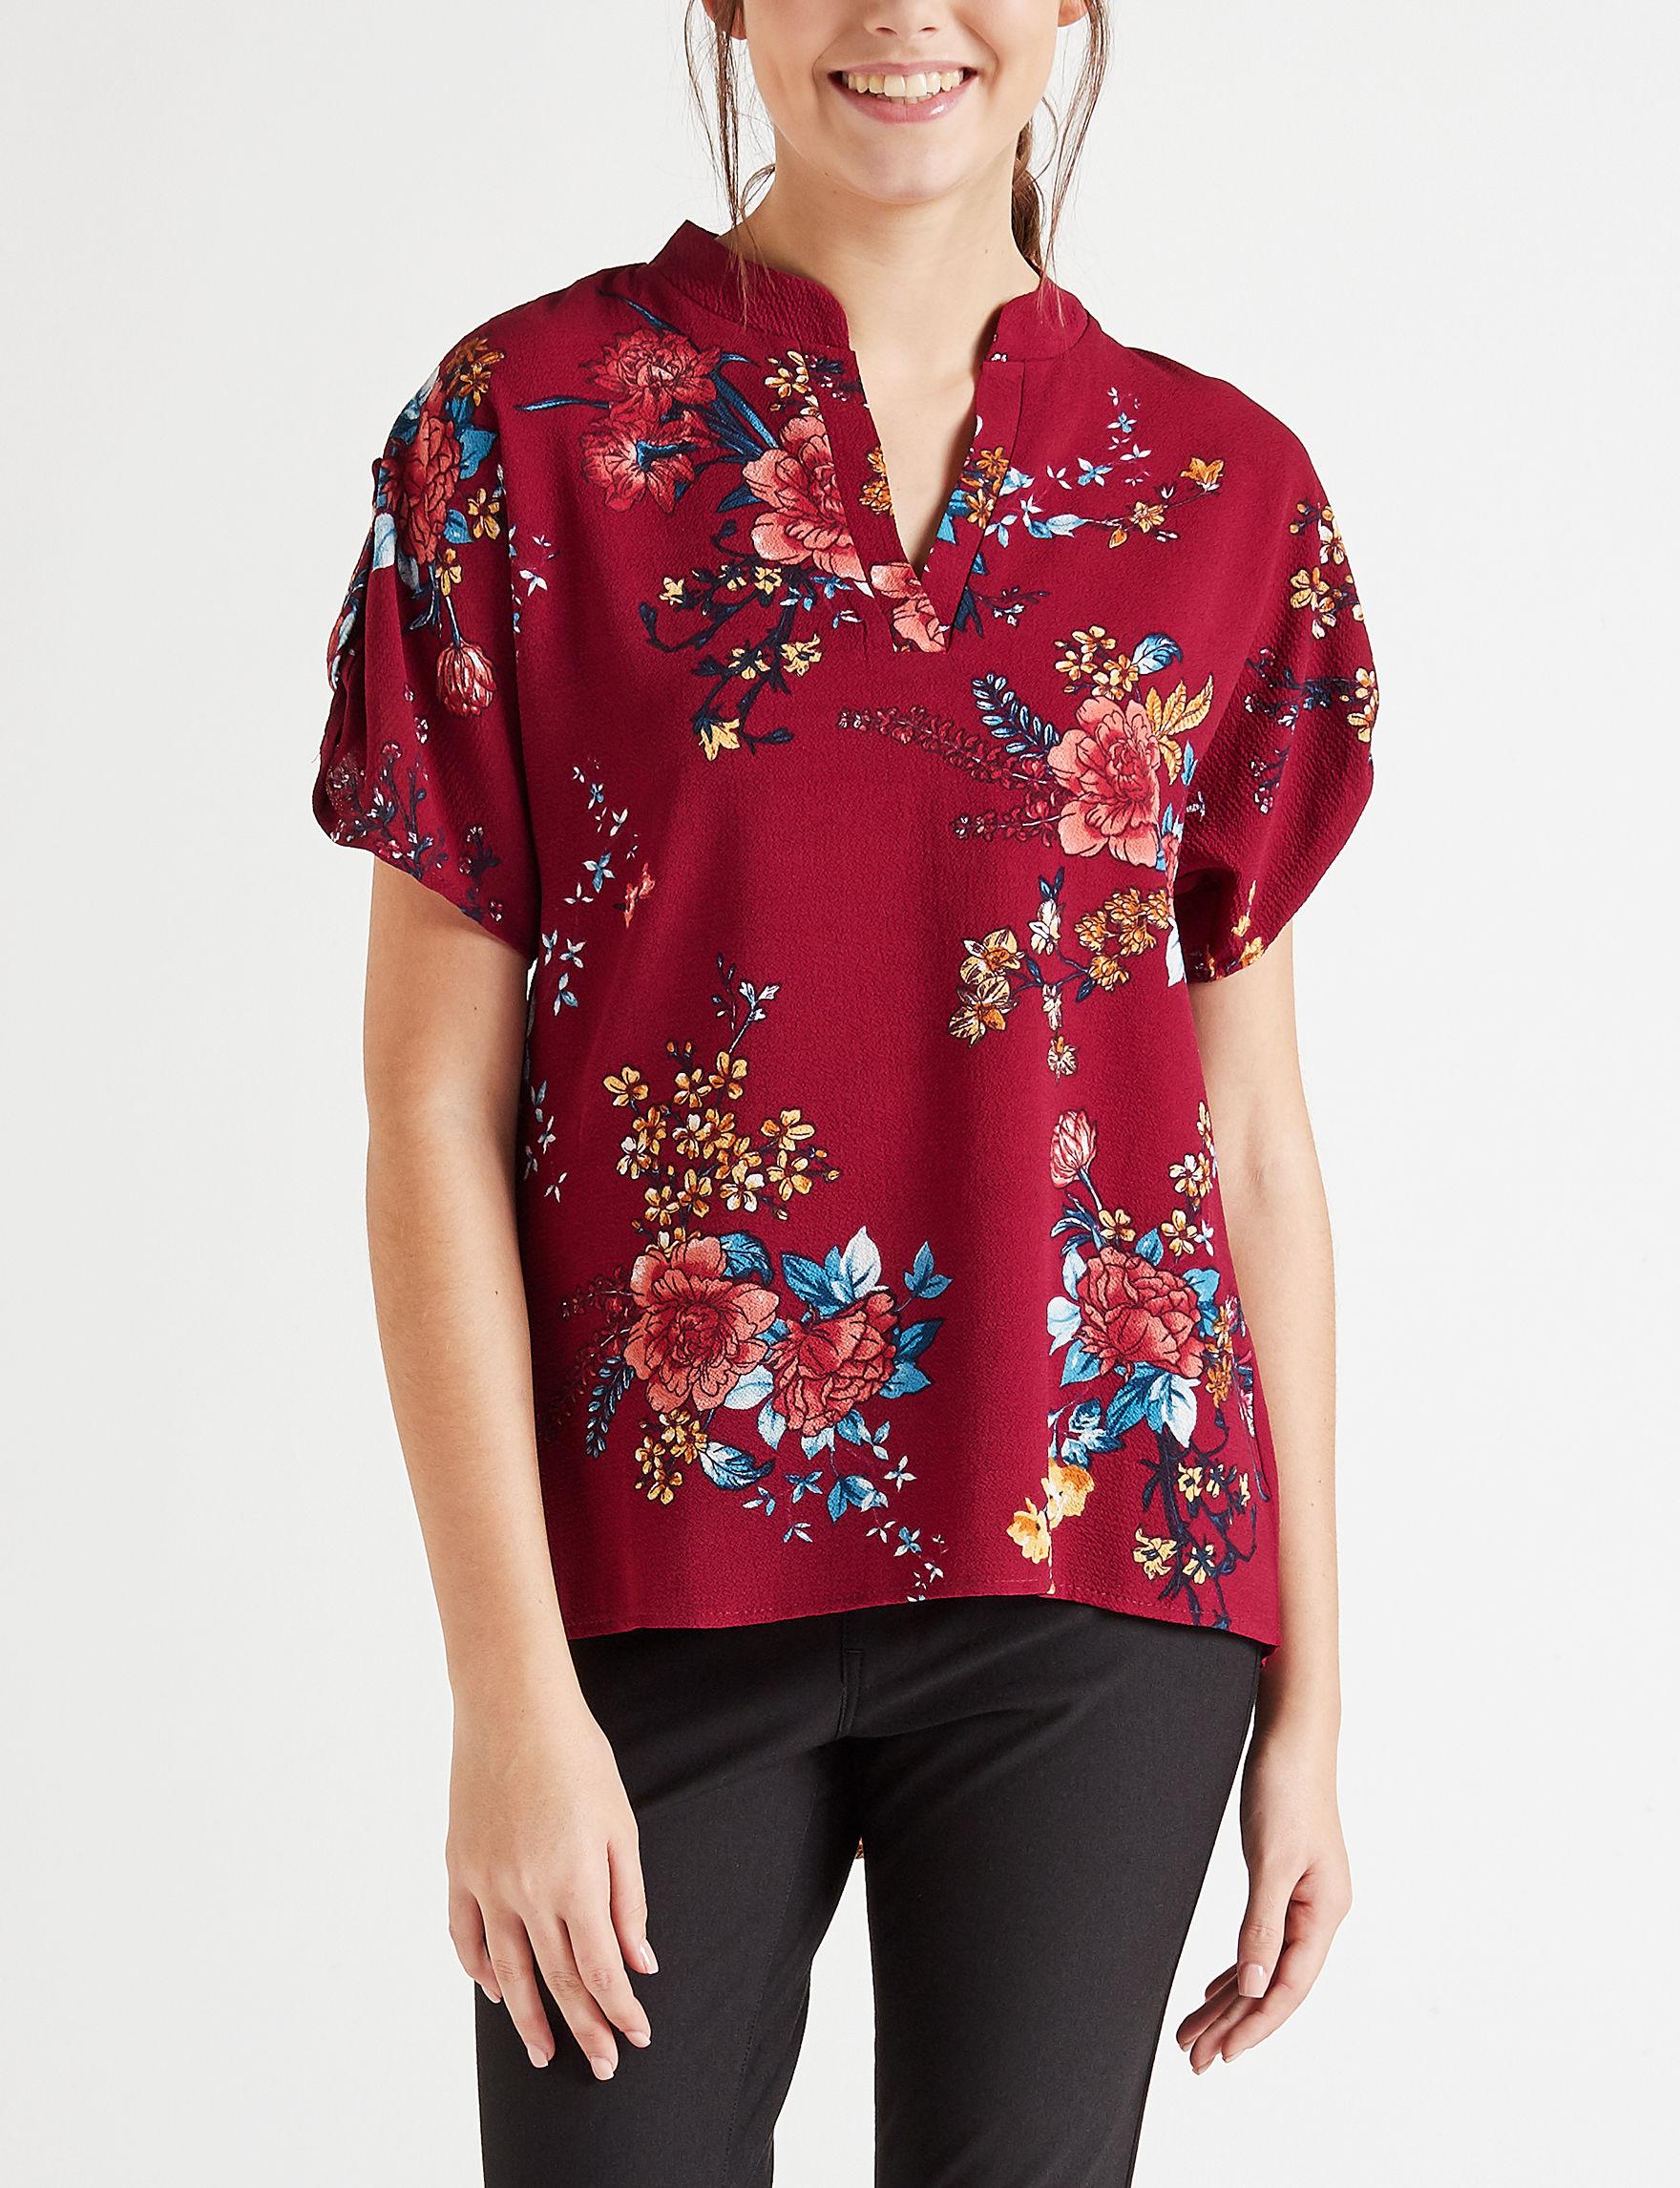 Wishful Park Maroon Shirts & Blouses